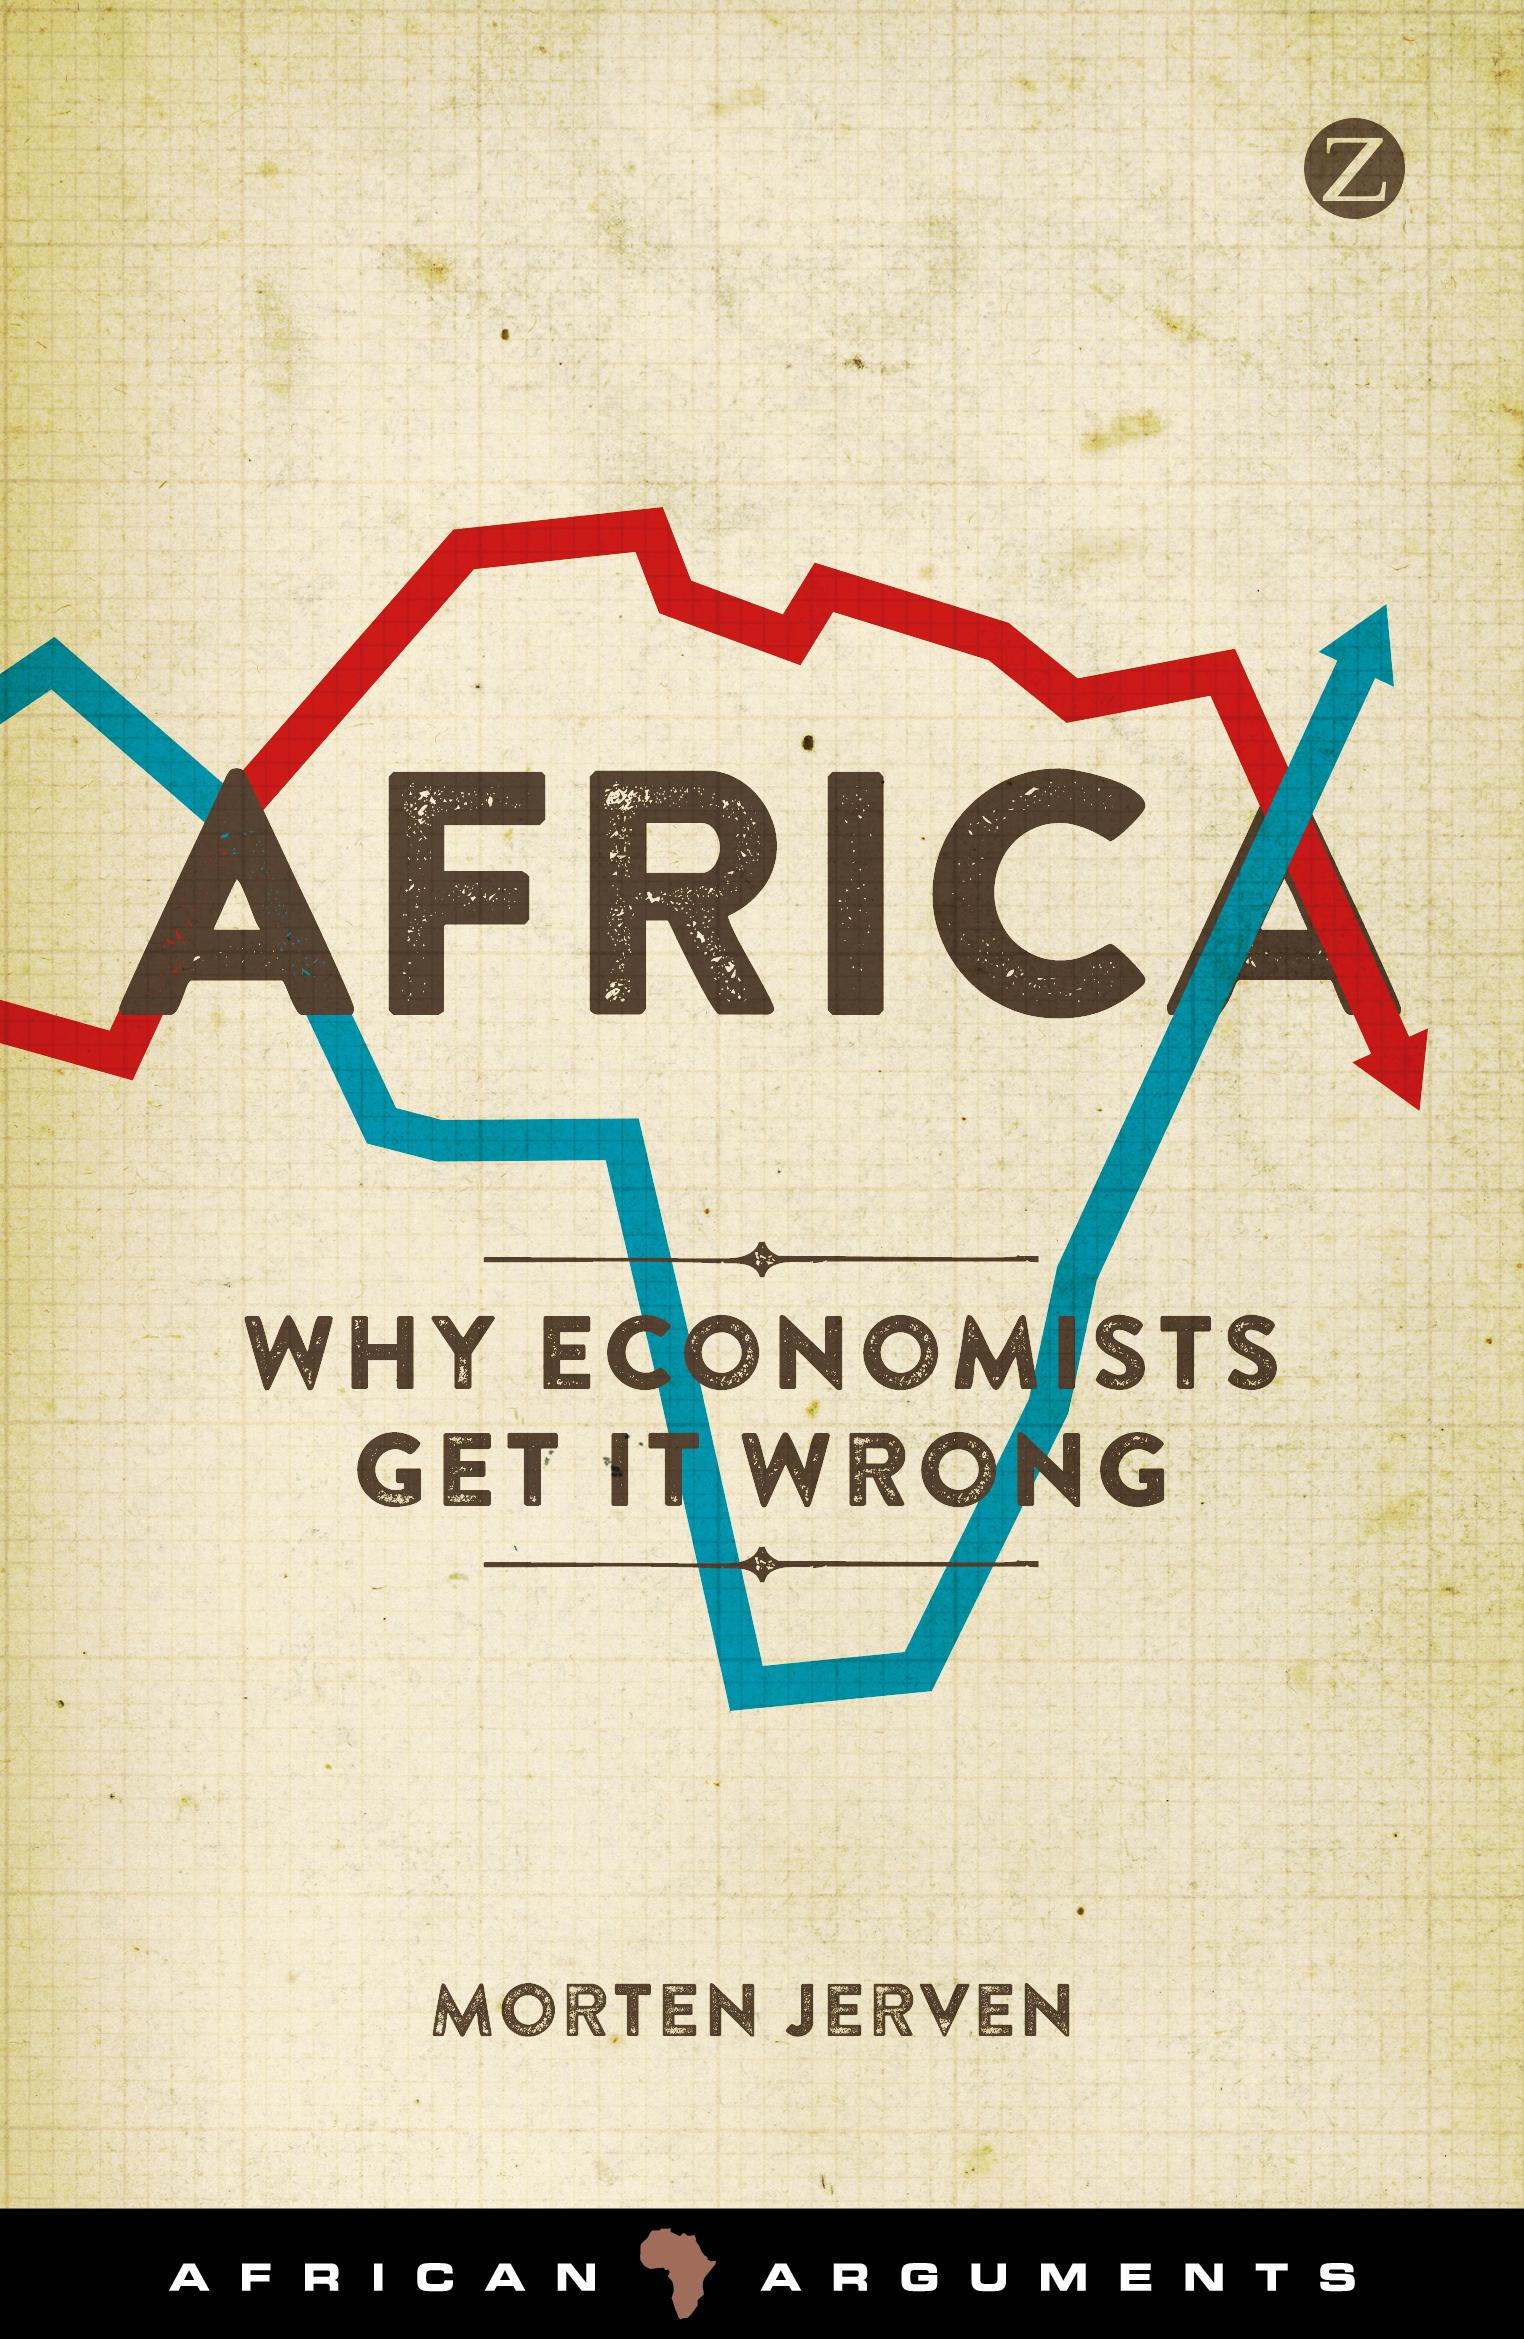 Jerven_AfricaWEGIW_Visuals_1#10